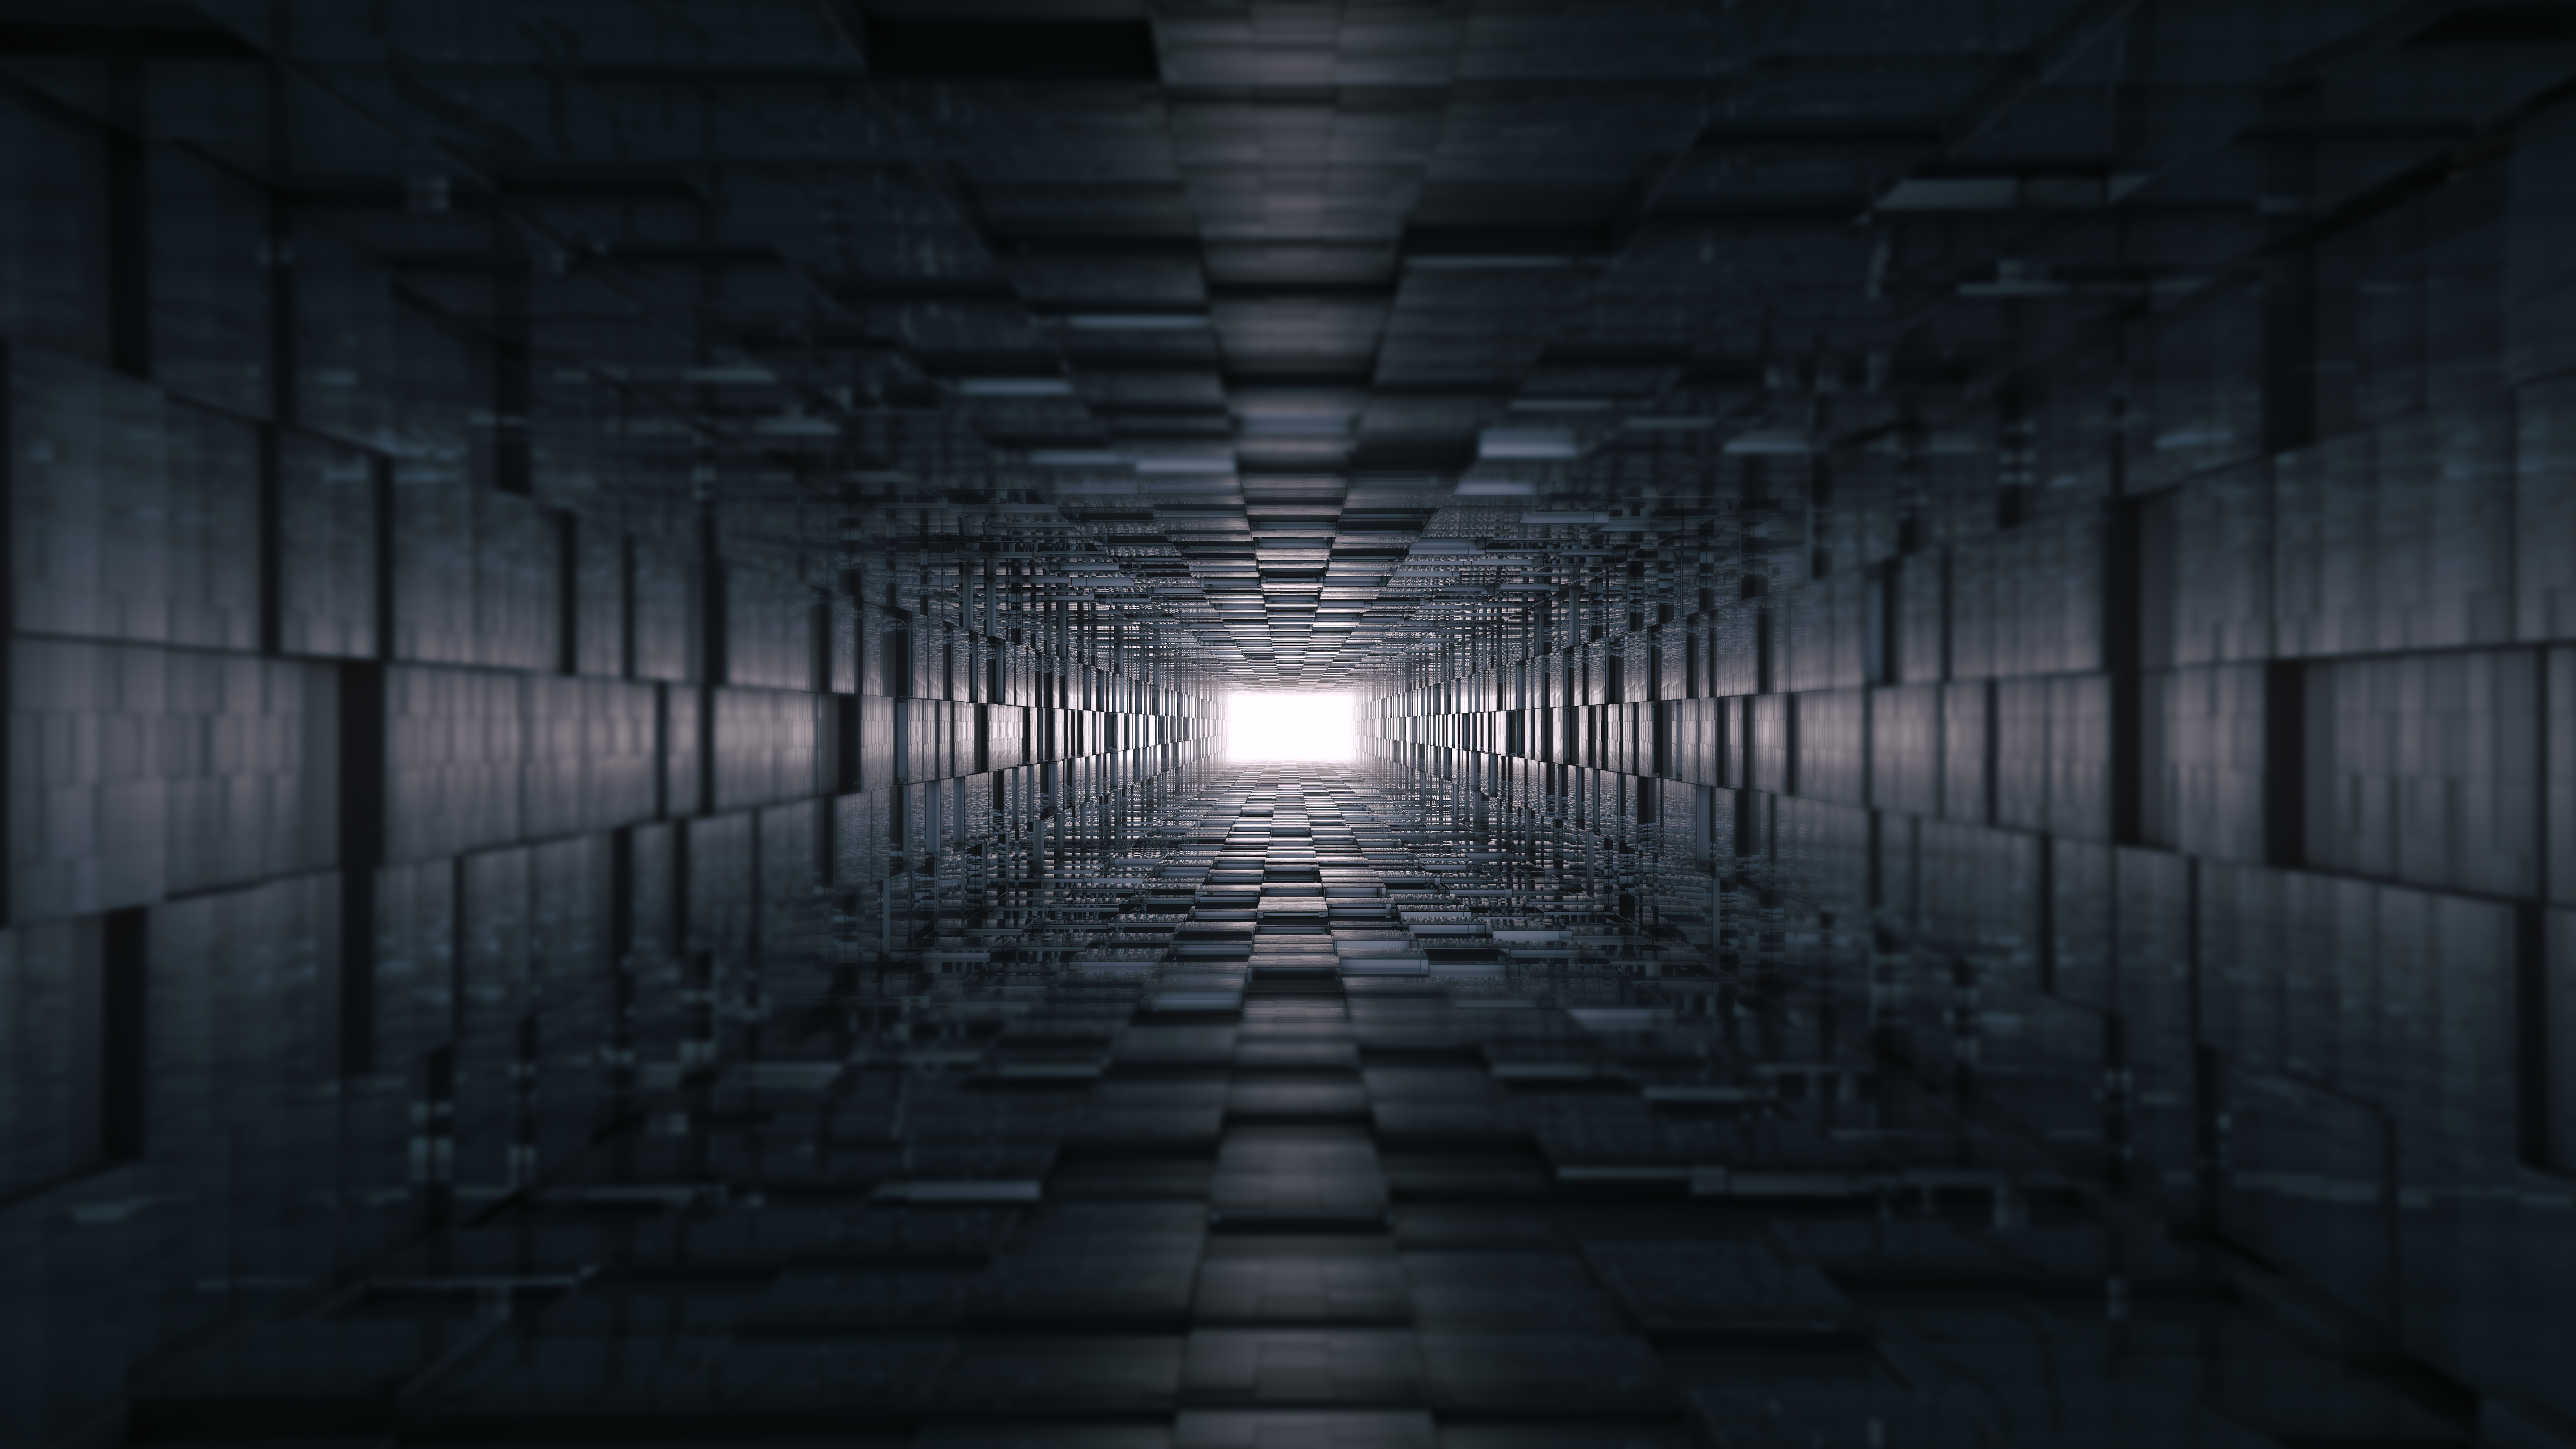 7680x4320 Abstract Dark Geometry 8k 8k Hd 4k Wallpapers